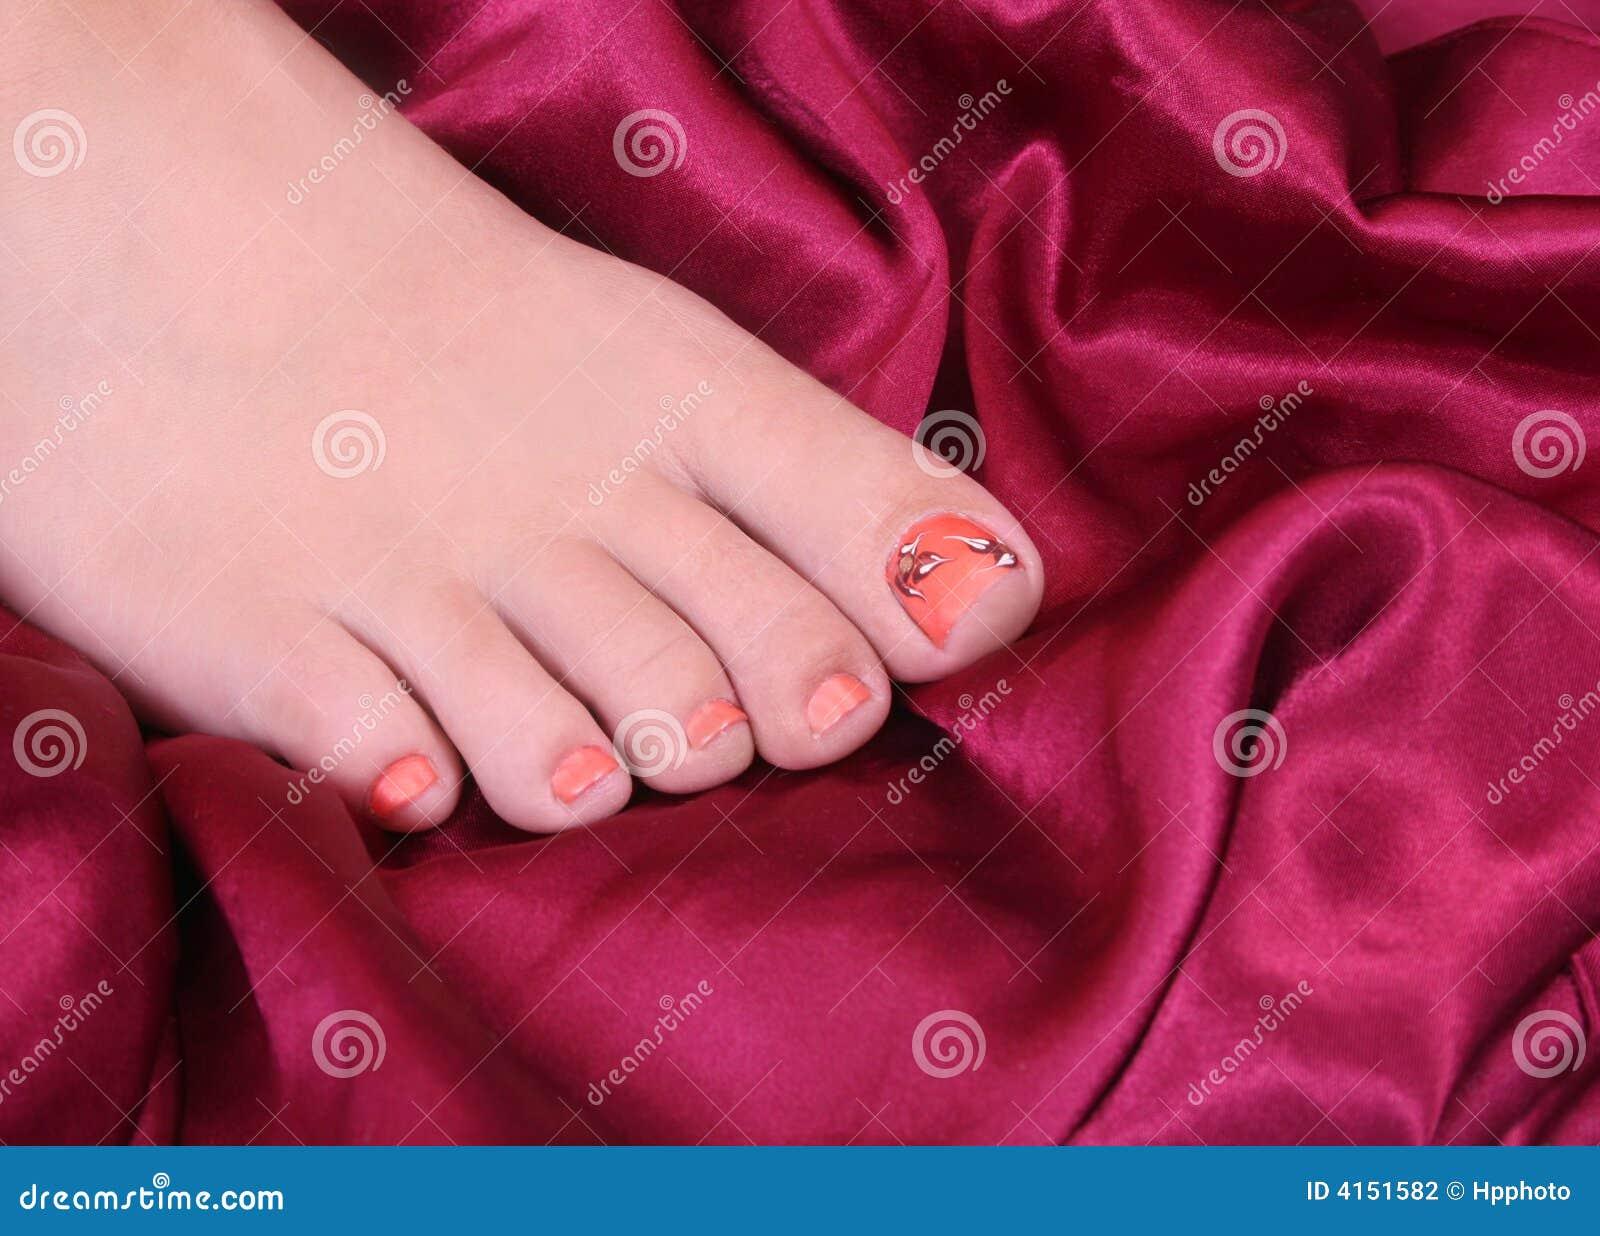 Hot Pink Satin Silk